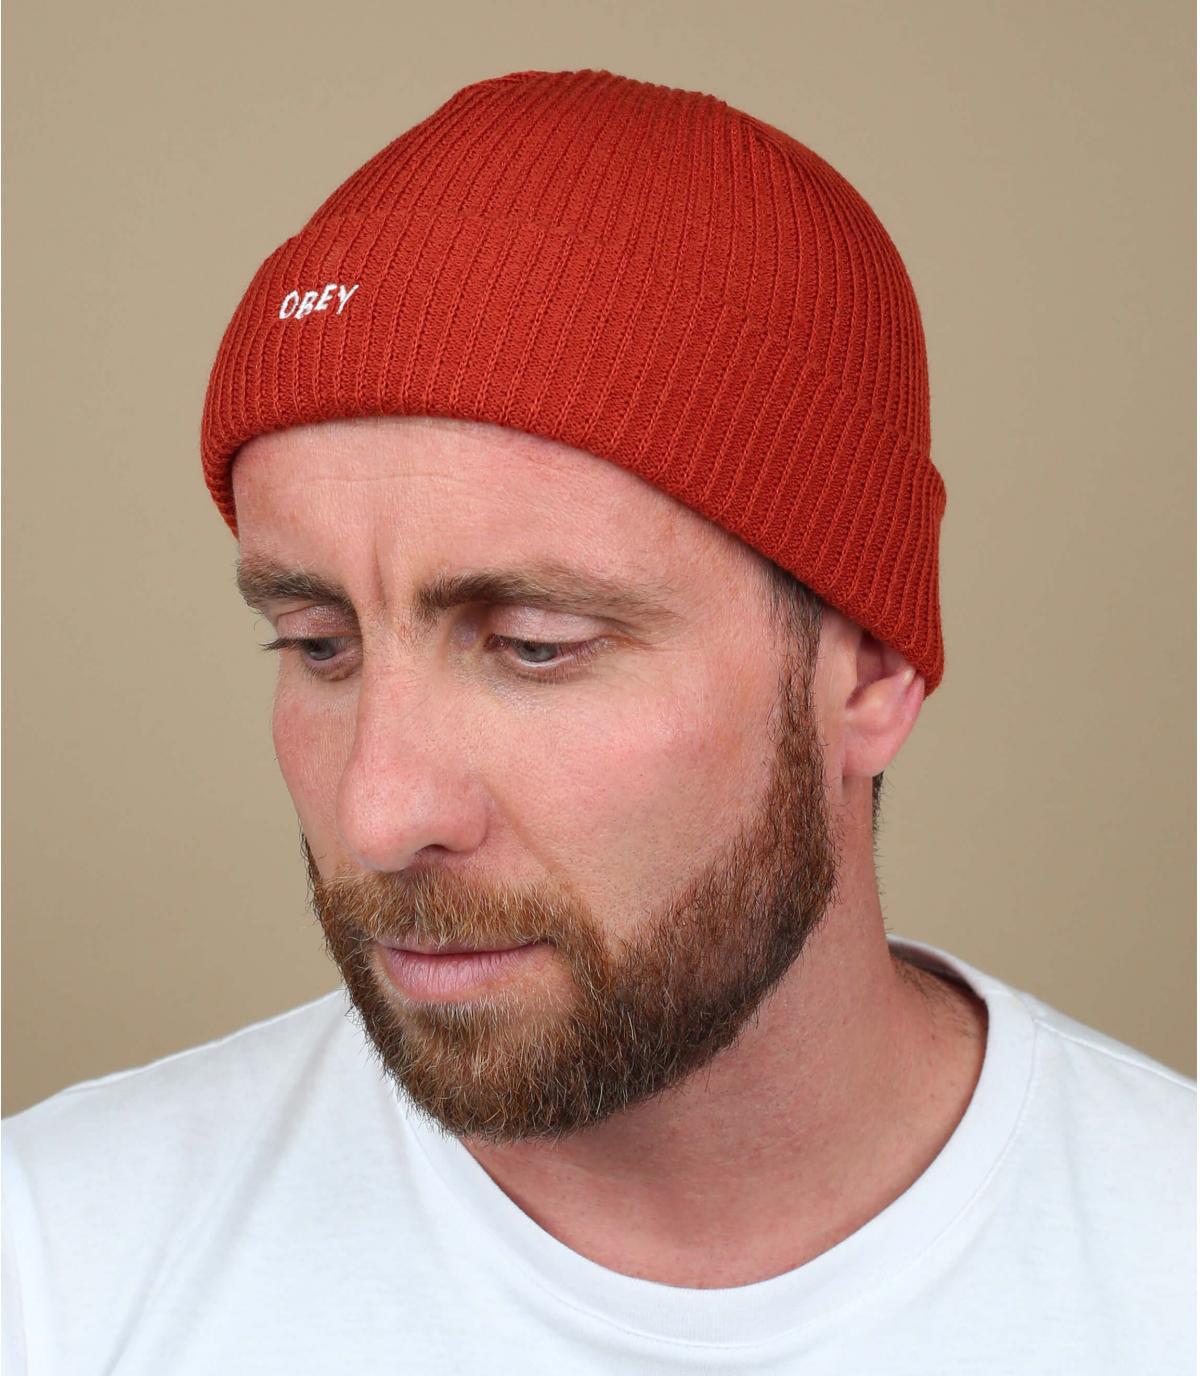 Obey red cuffed beanie